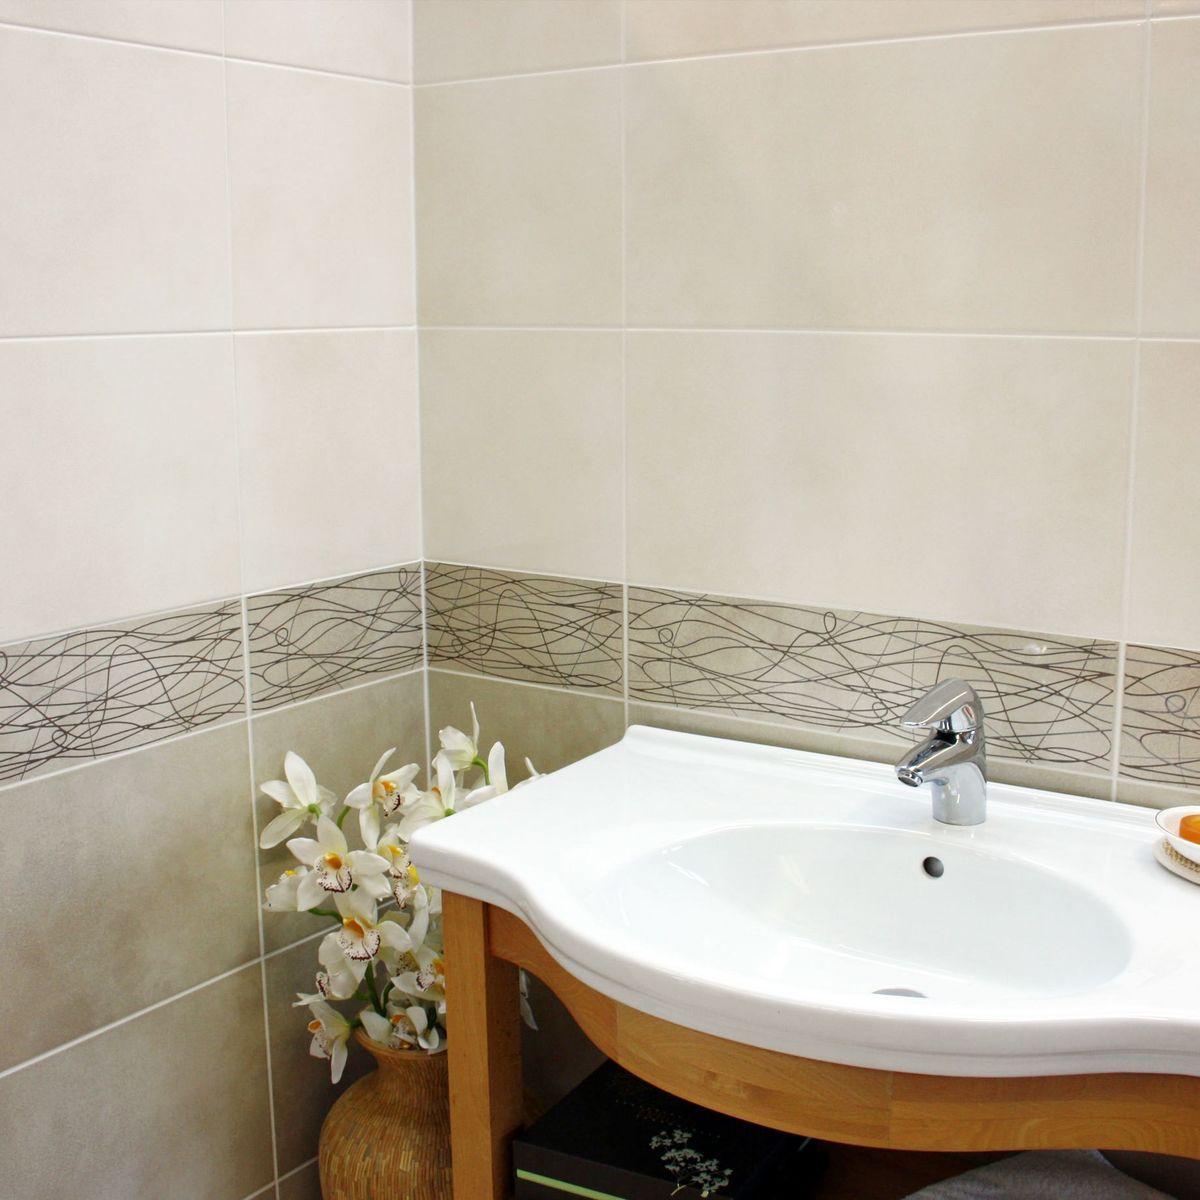 Bloom Cream Wall Tiles Clearance Bloom Cream Wall Tiles Clearance In 2019 Kitchen Bath Cream Walls Wall Tiles Home Decor